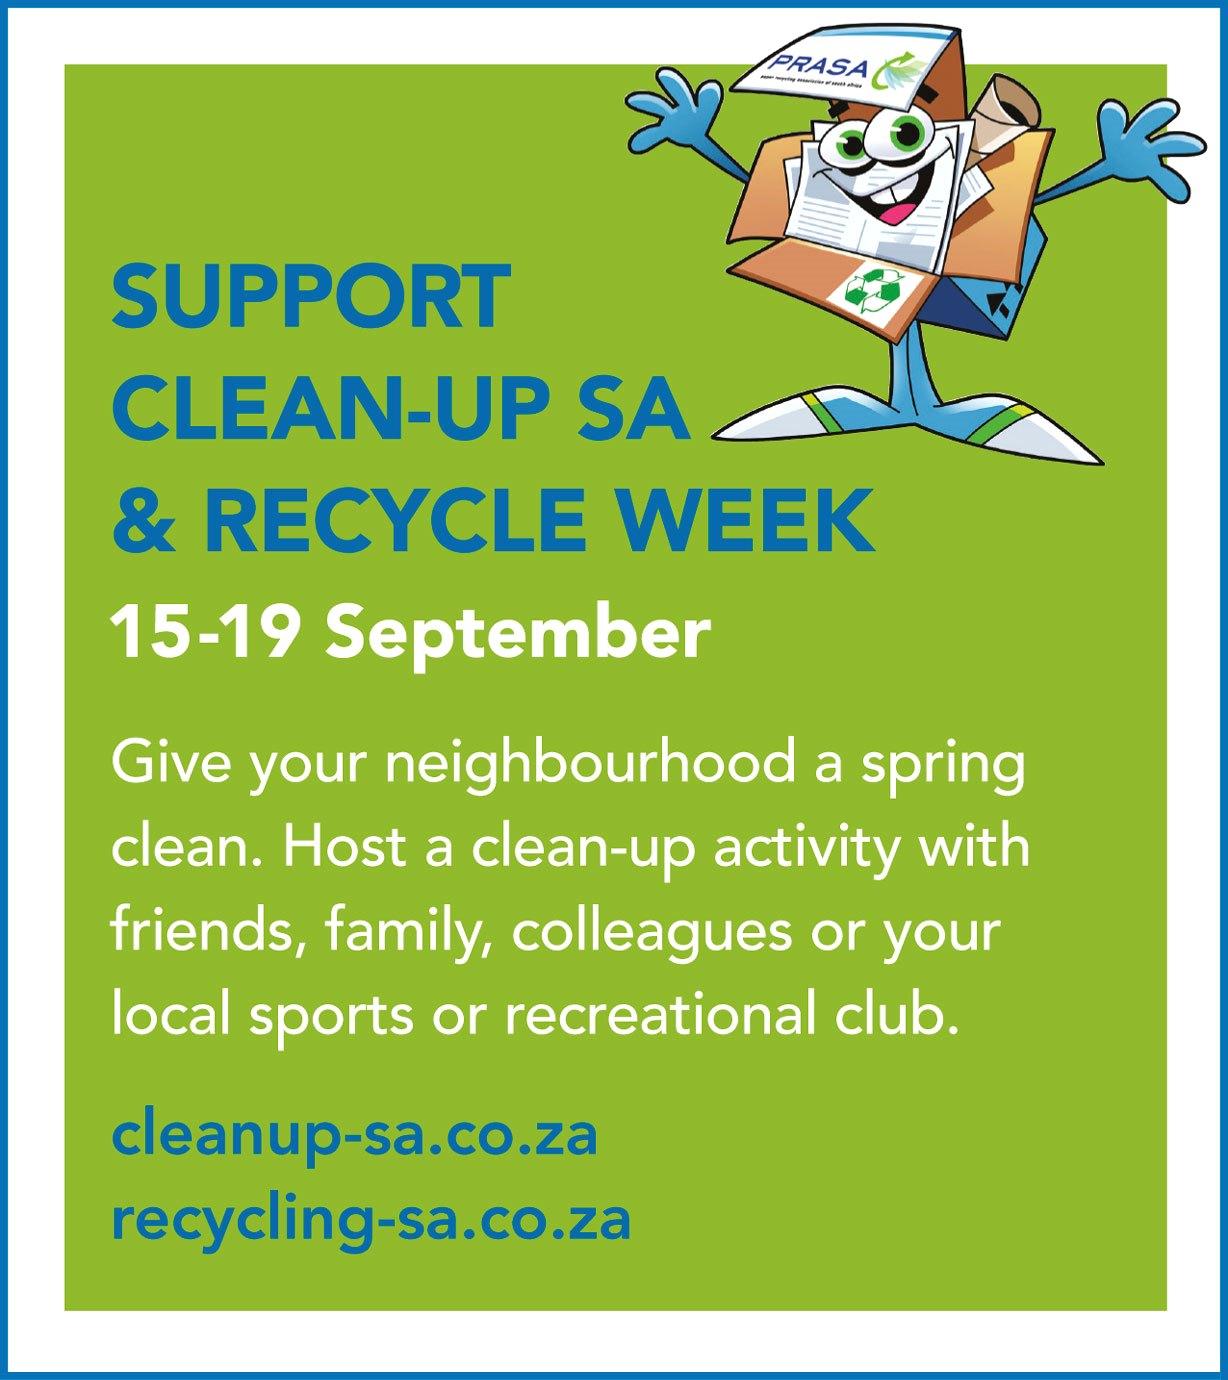 Clean-Up & Recycle Week SA Plastics